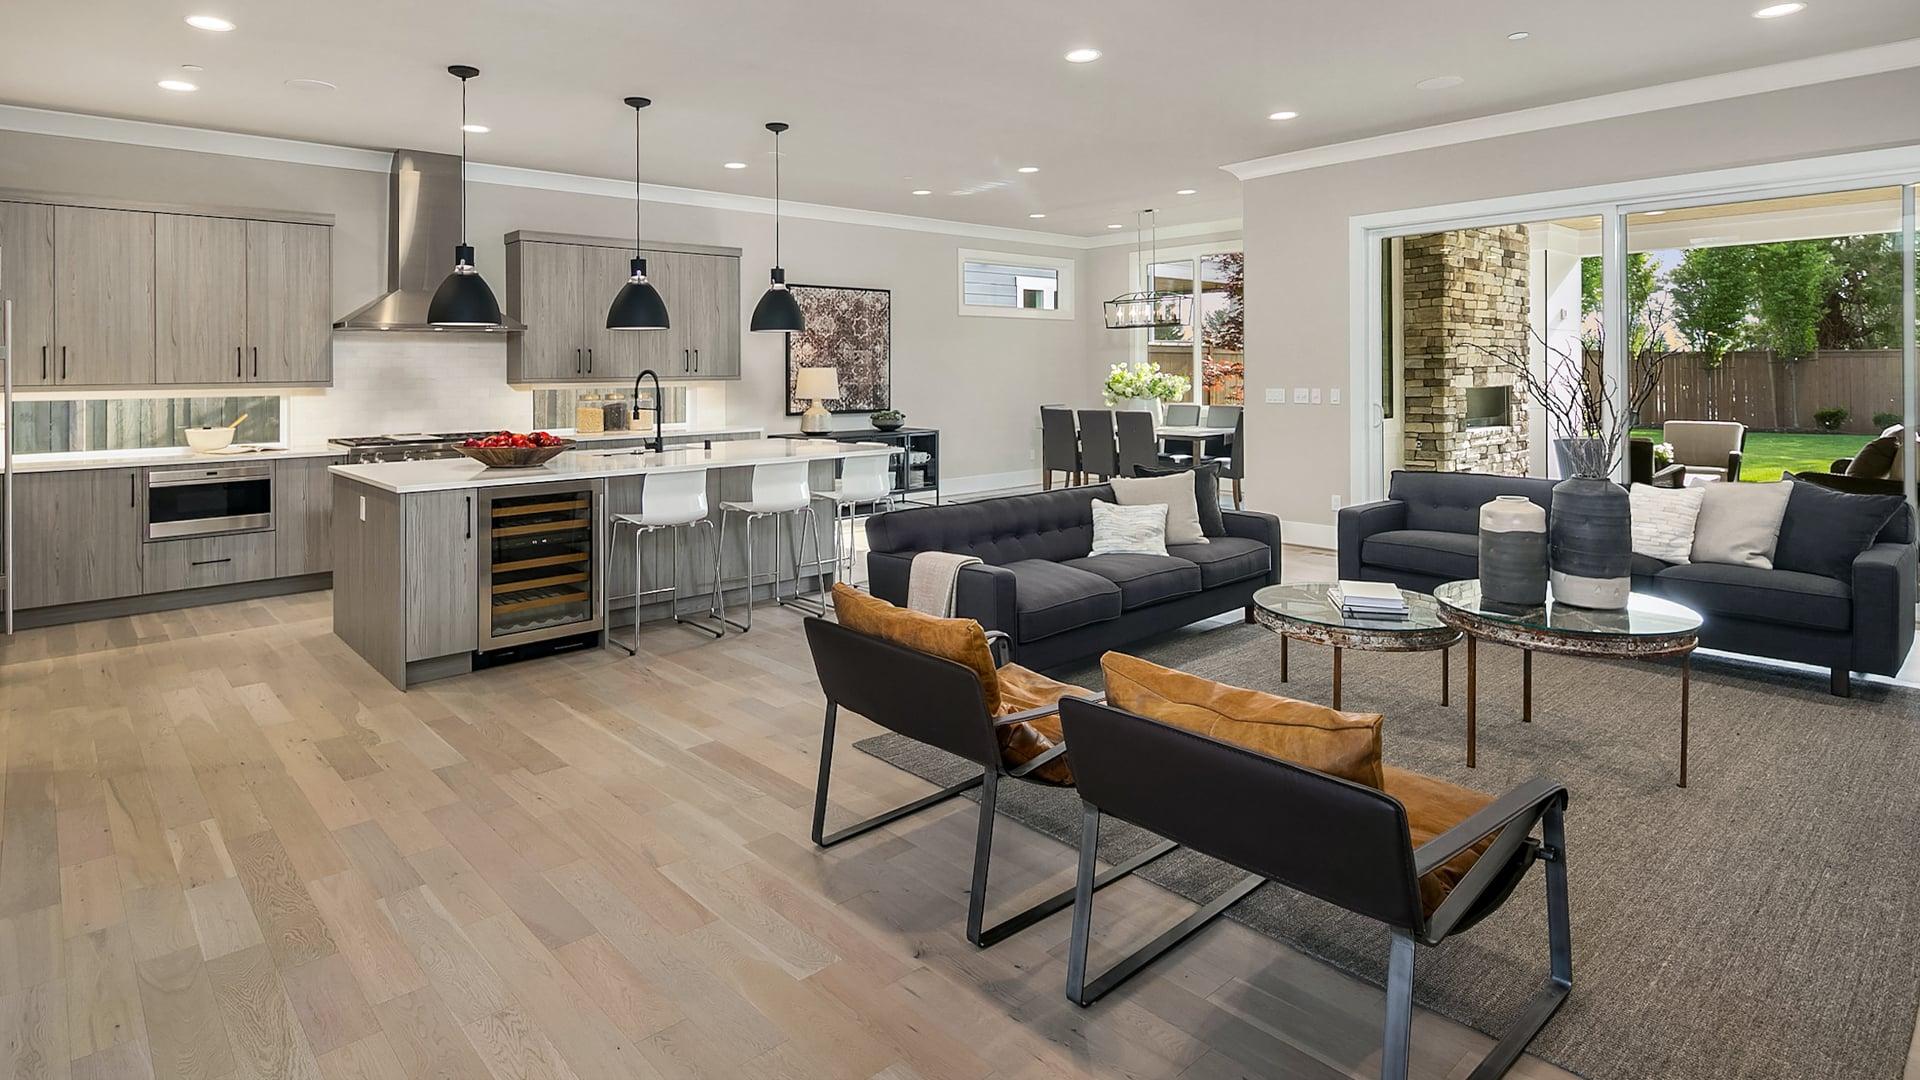 Design Built Homes presents 705 3rd Lane South in Kirkland, WA